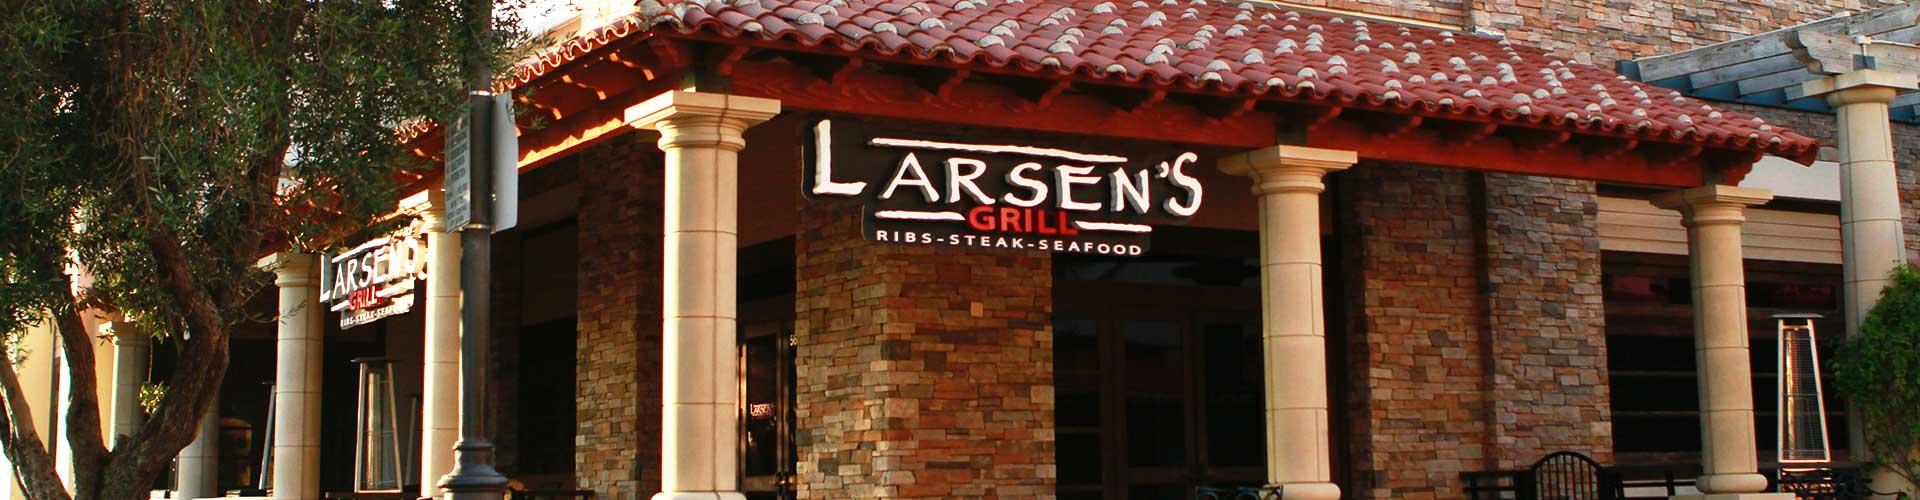 Larsens Header